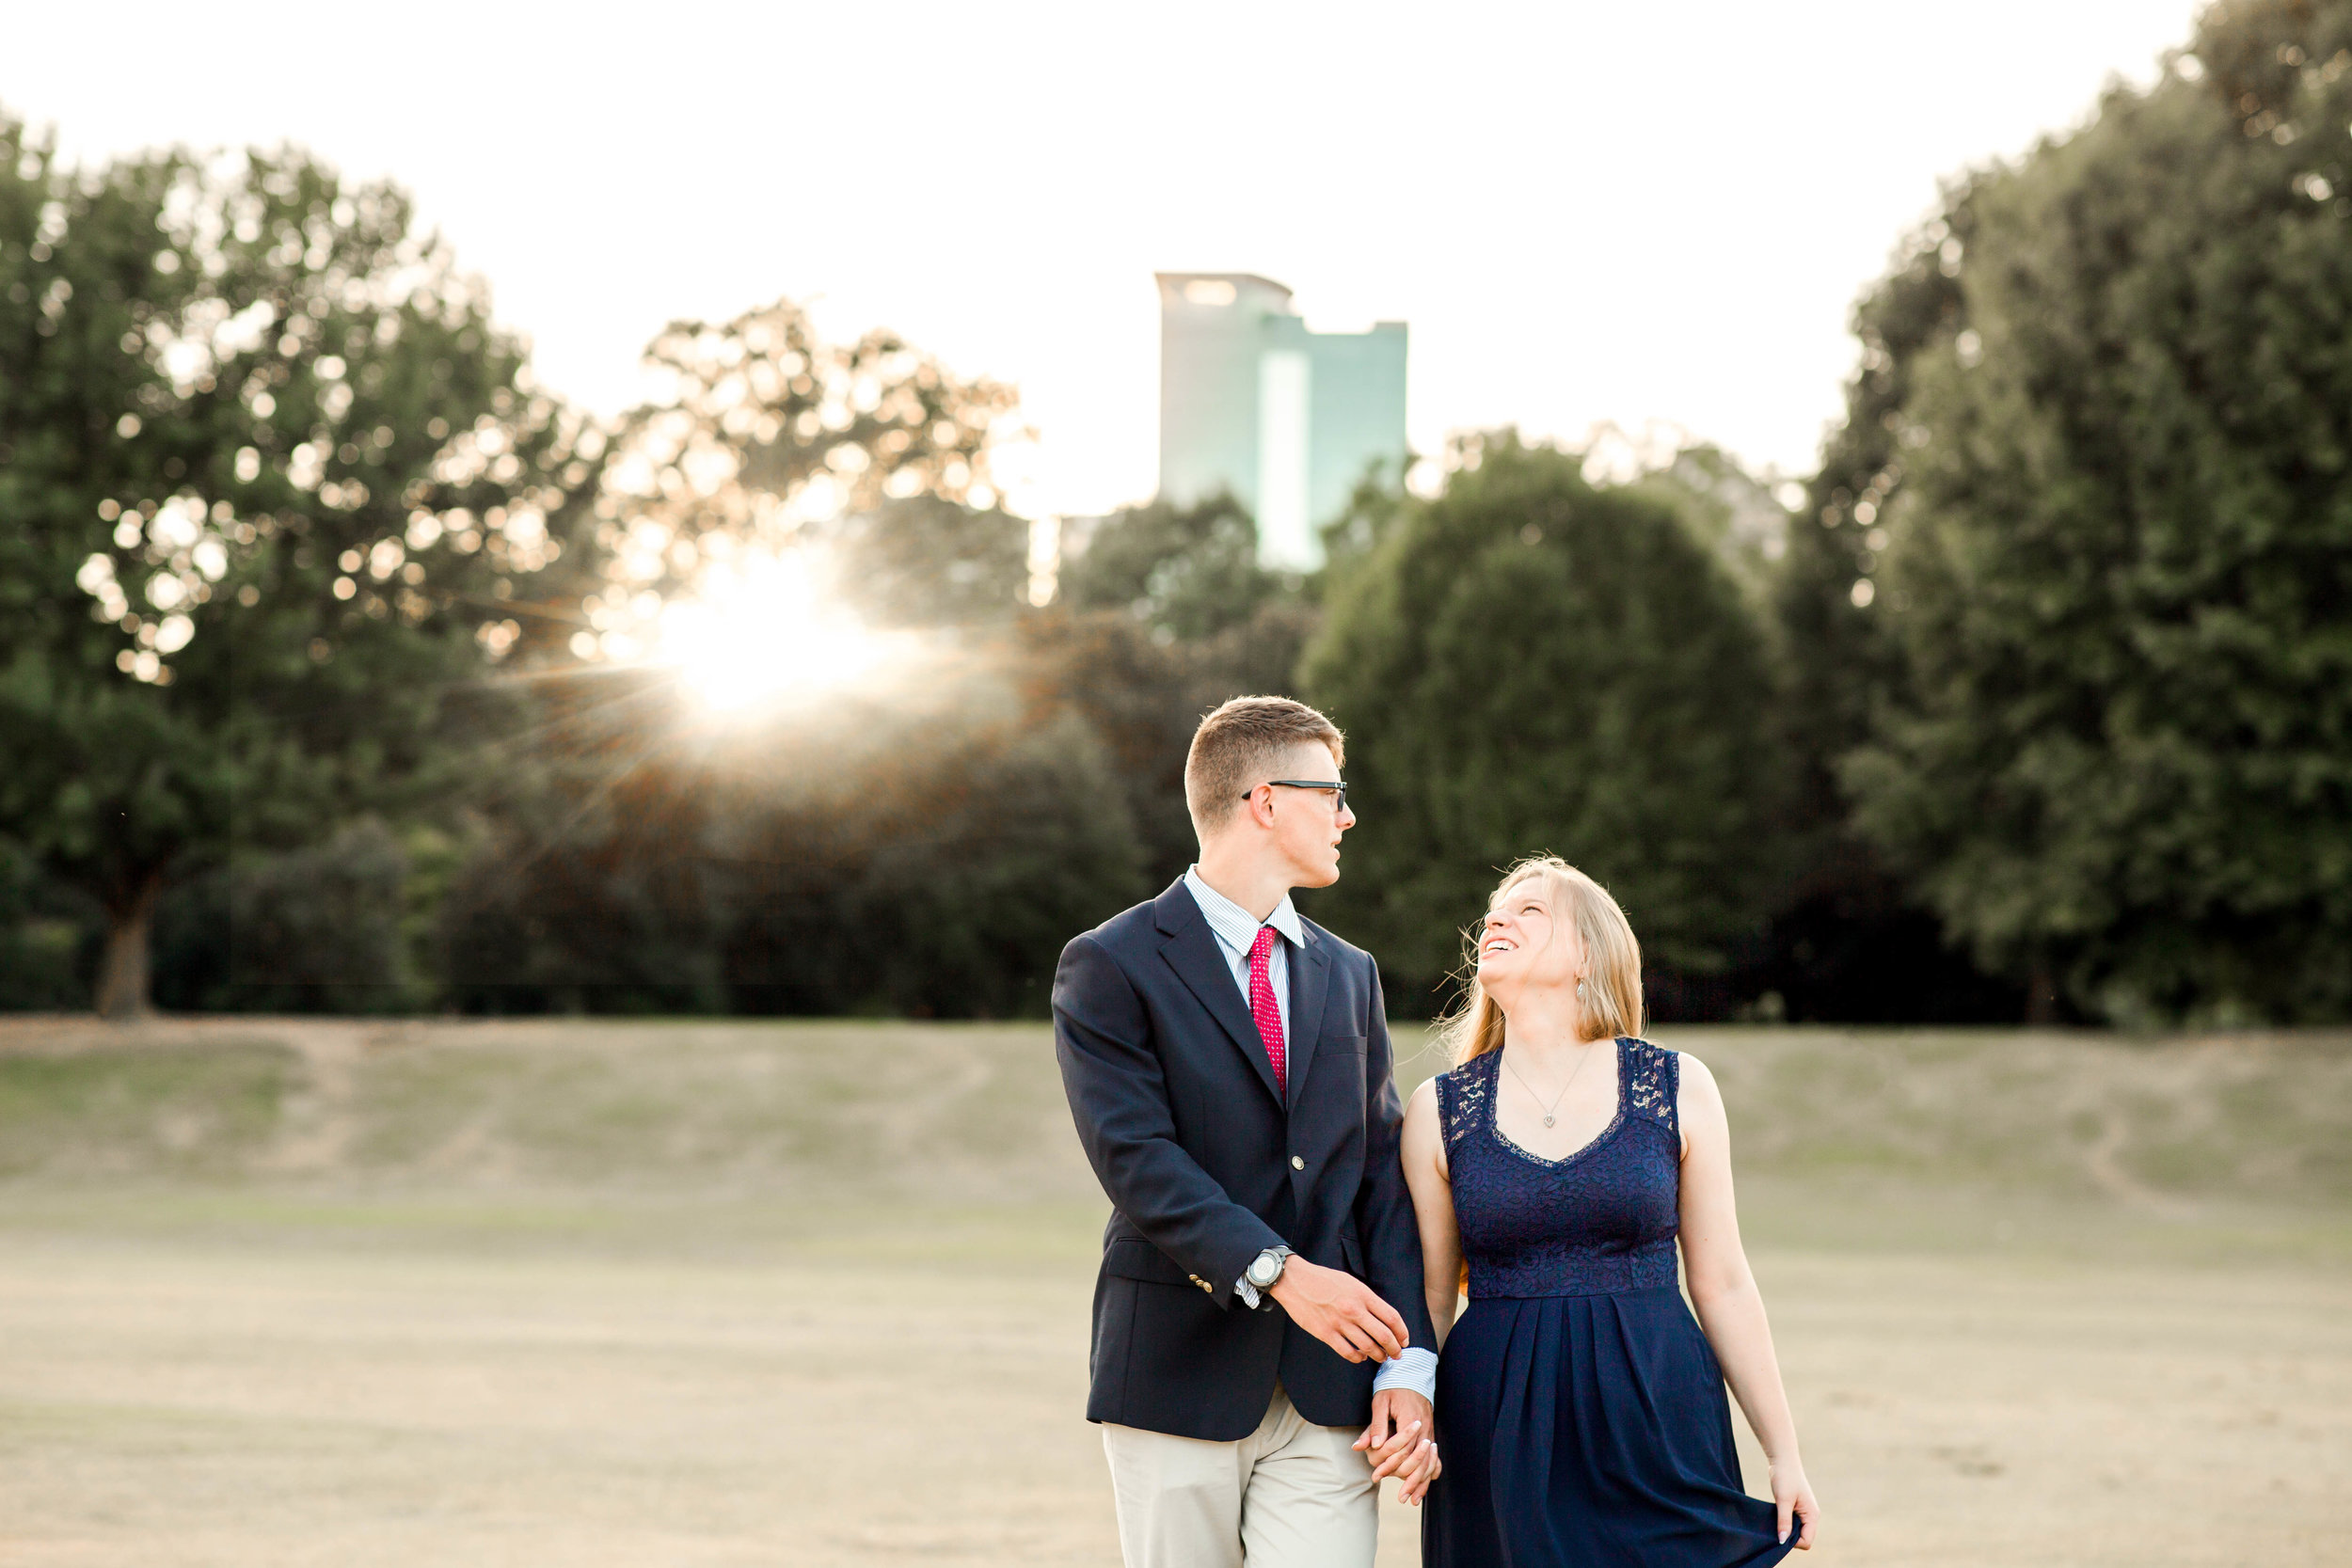 MaryElizabeth_Will_Engagement-153.JPG